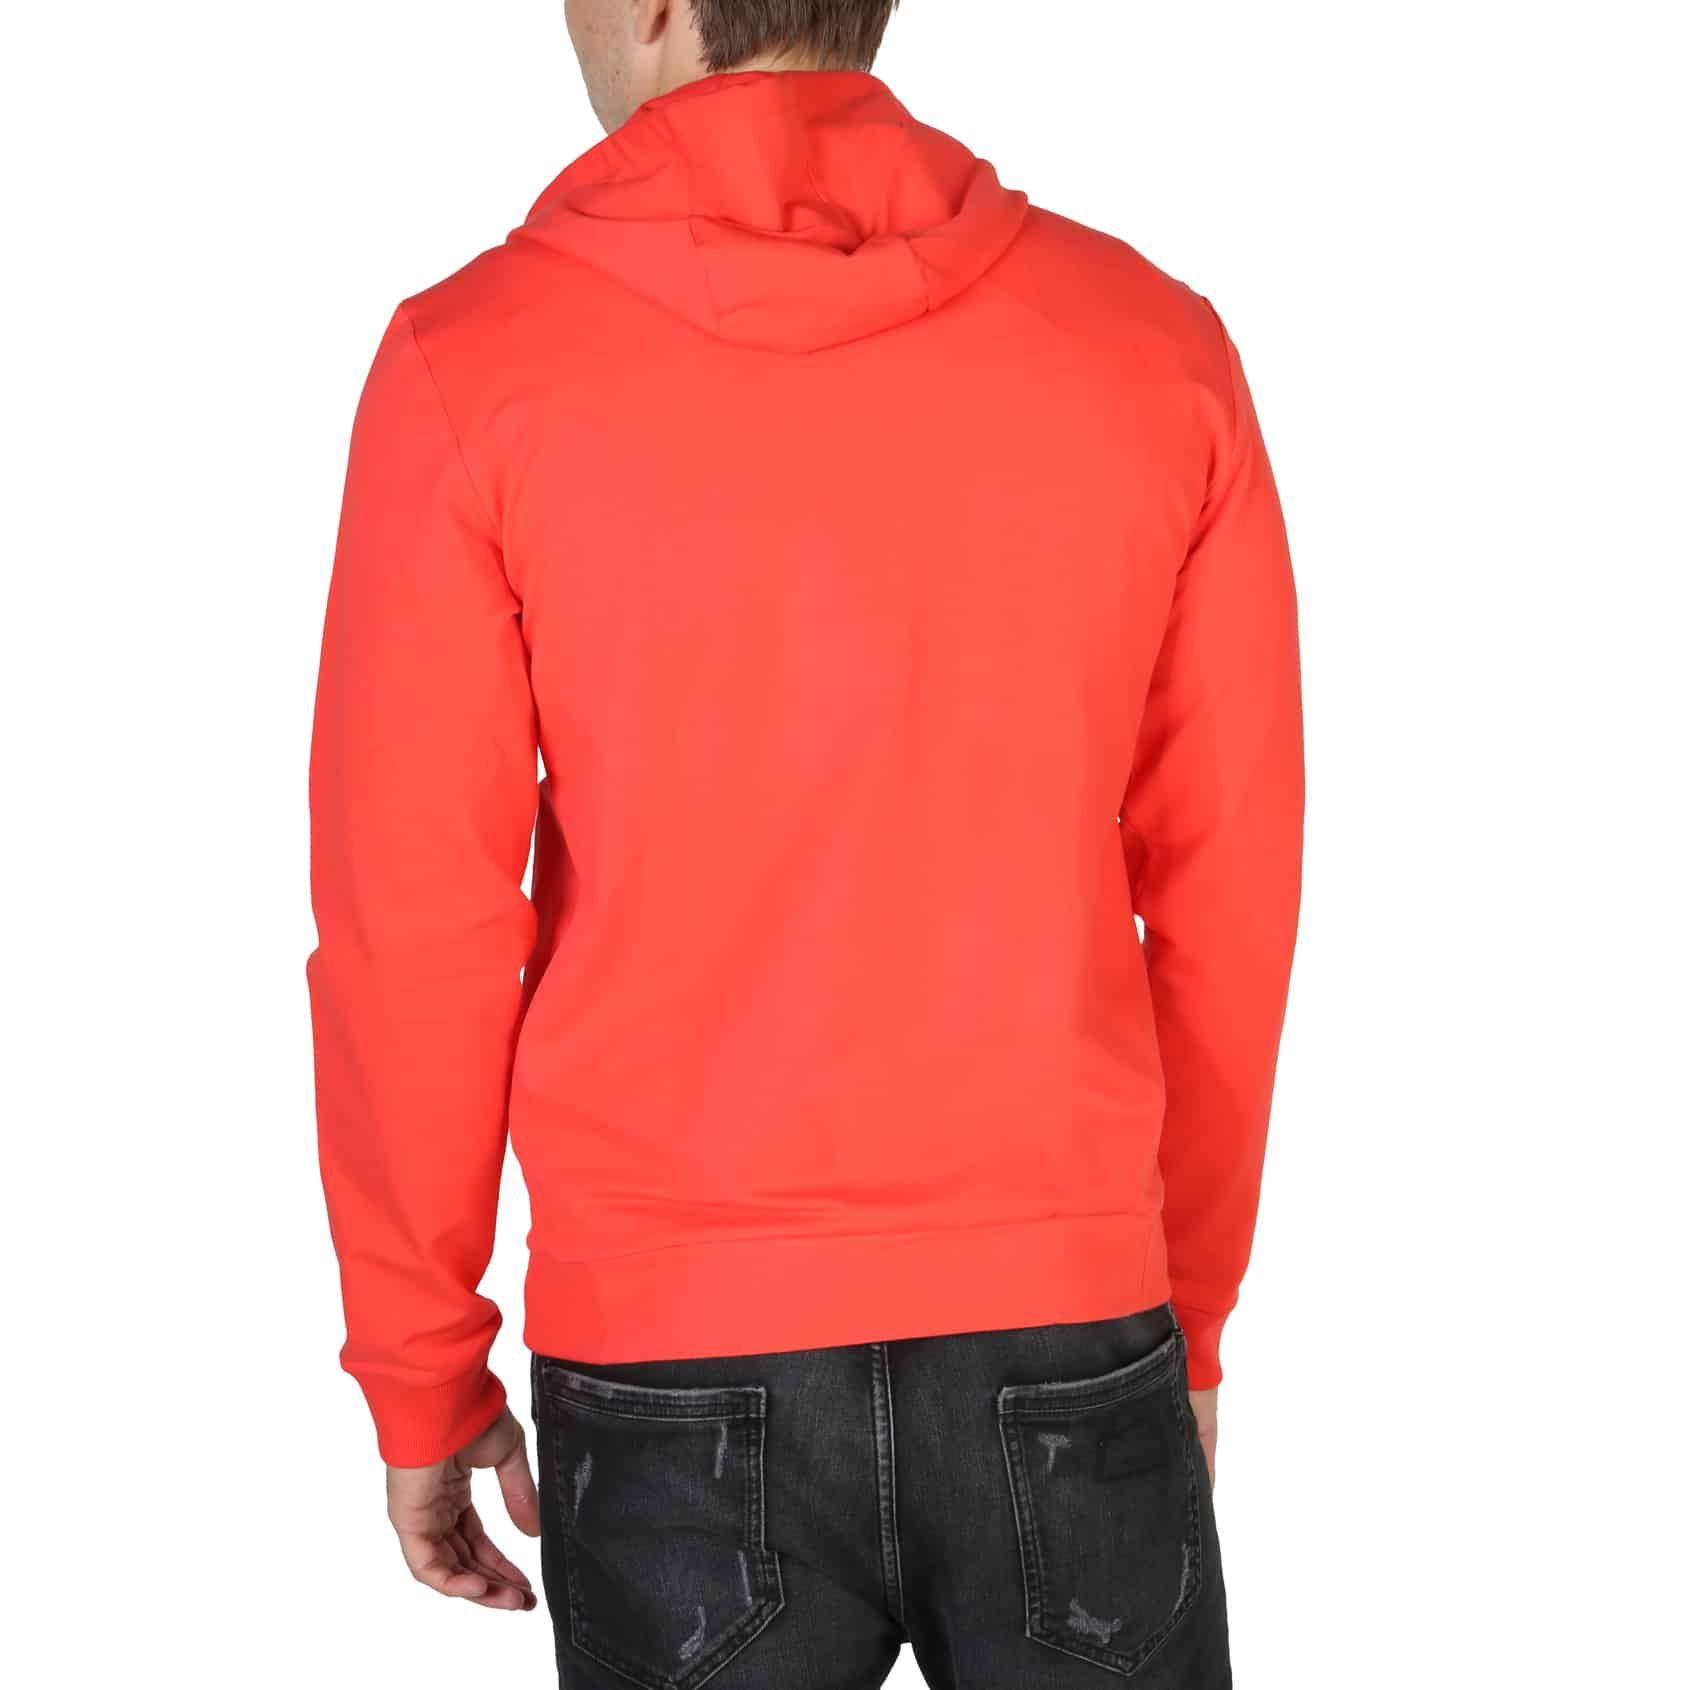 Bekleidung EA7 – 274703_6P204 – Rot